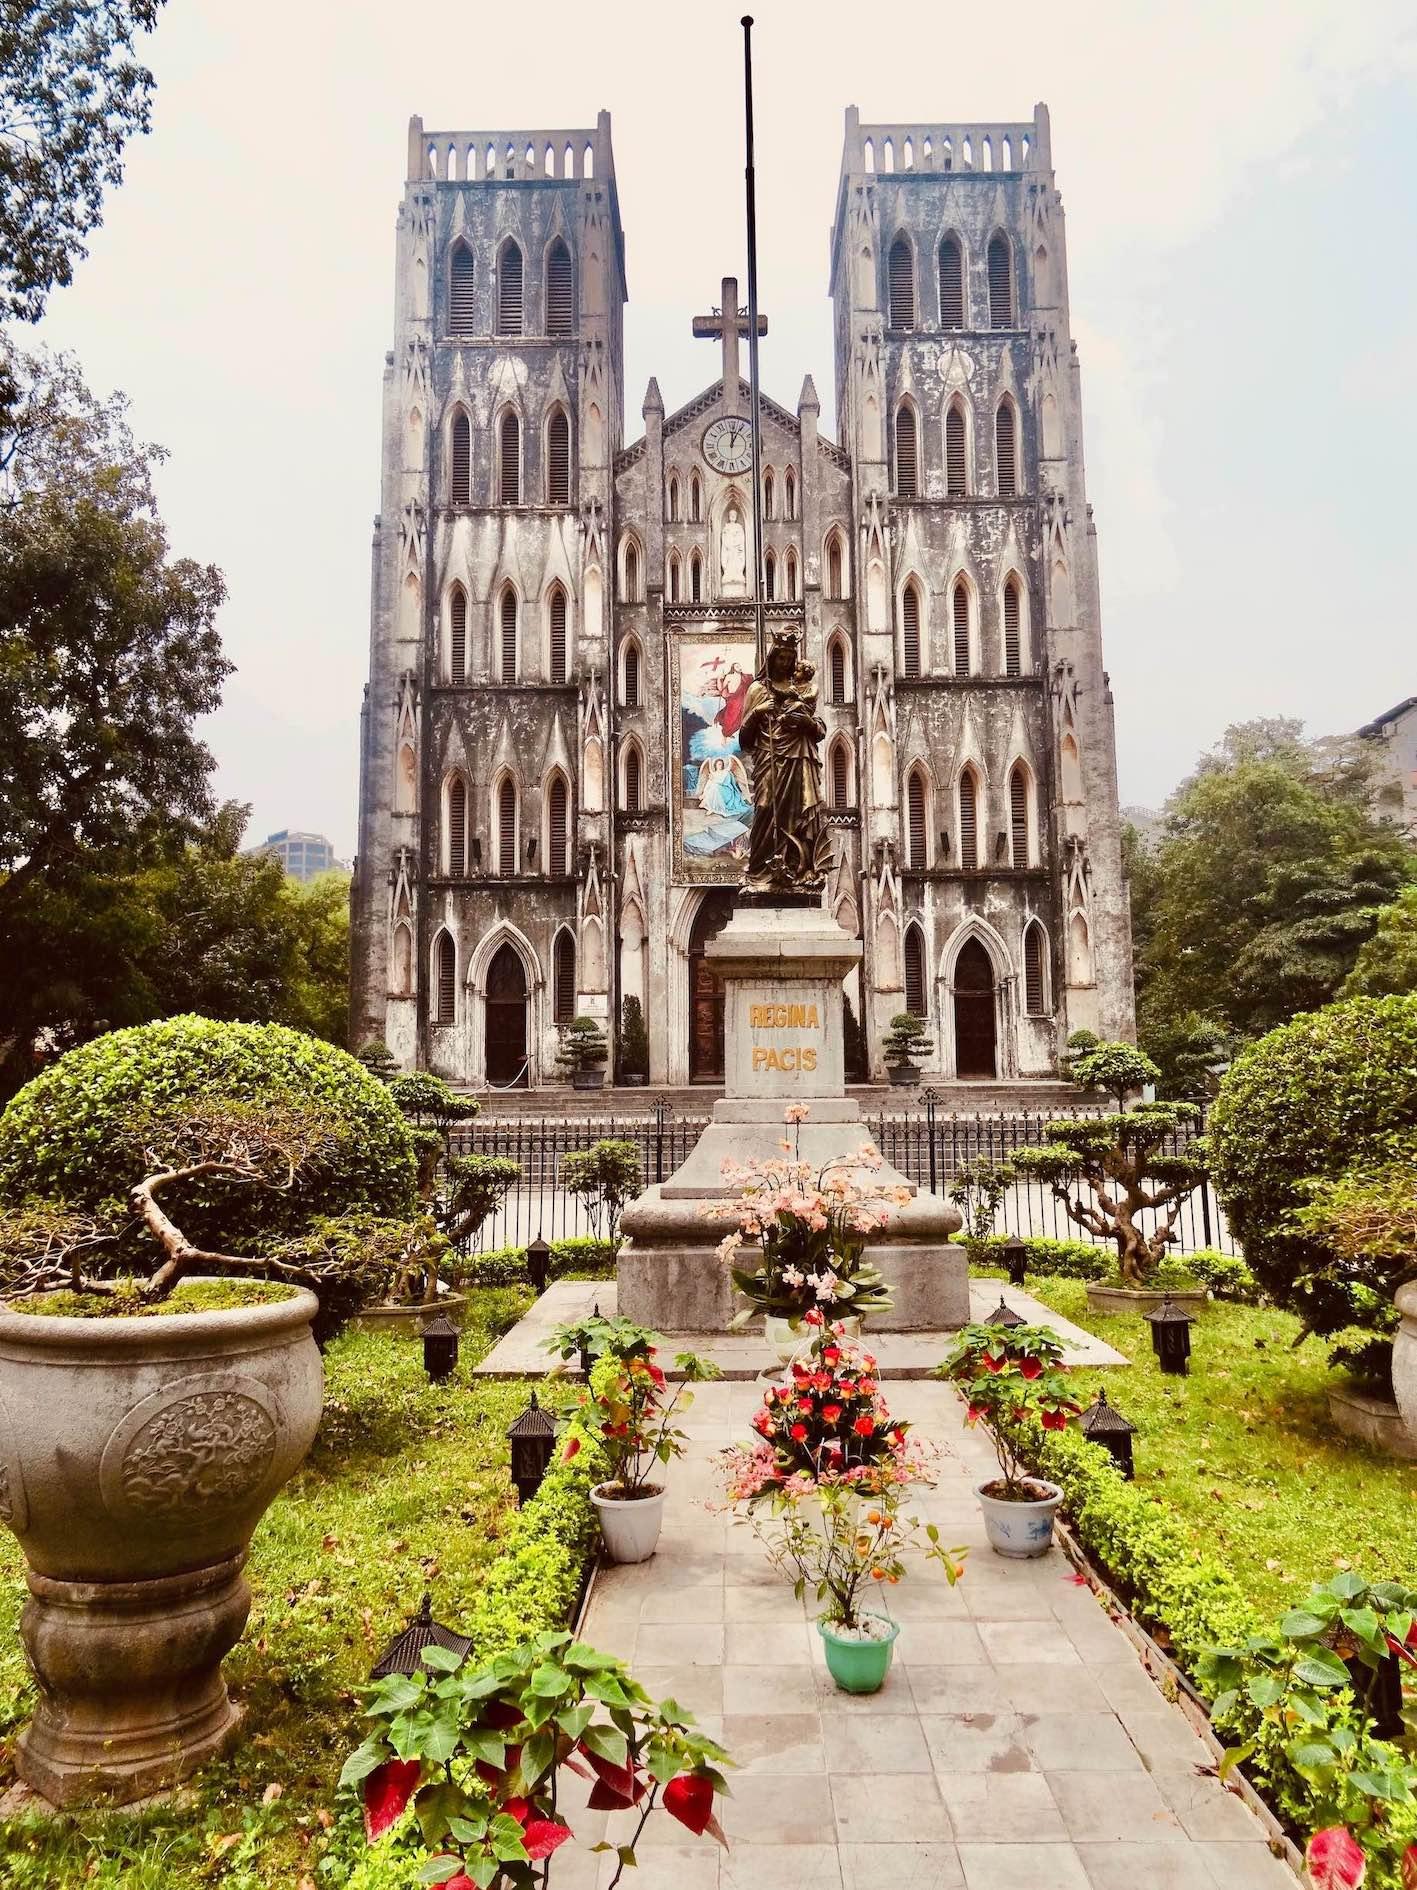 St. Joseph's Cathedral Cool Spots Around Hanoi